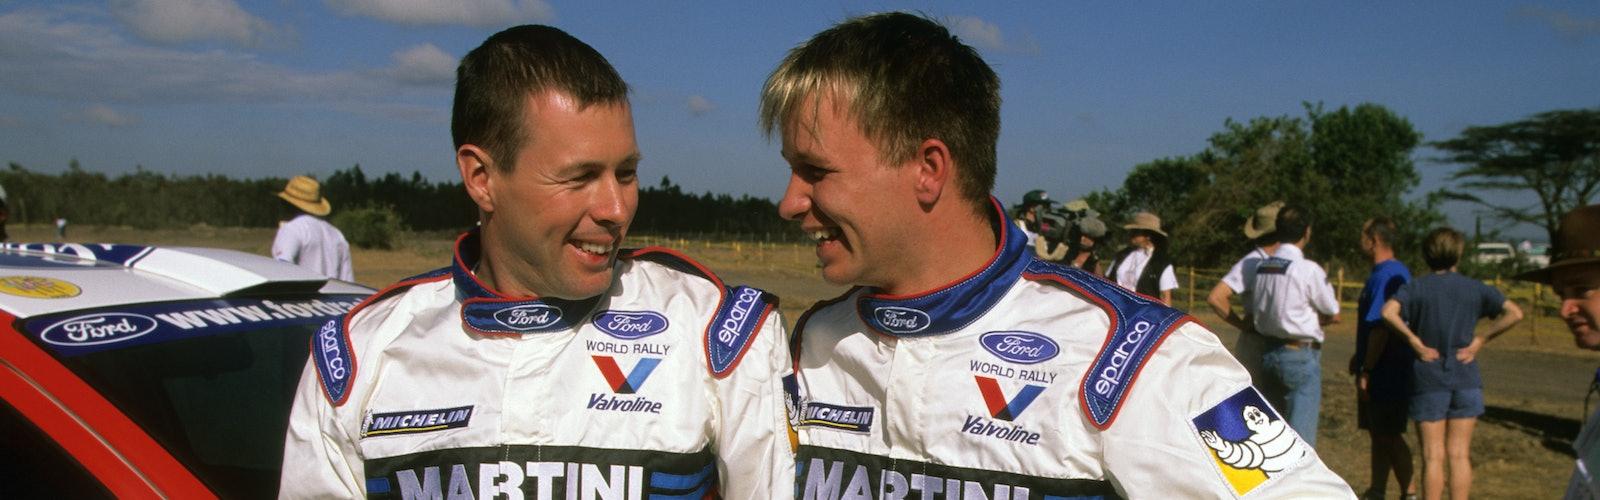 1999 Safari Rallyworld wide copyright: McKlein